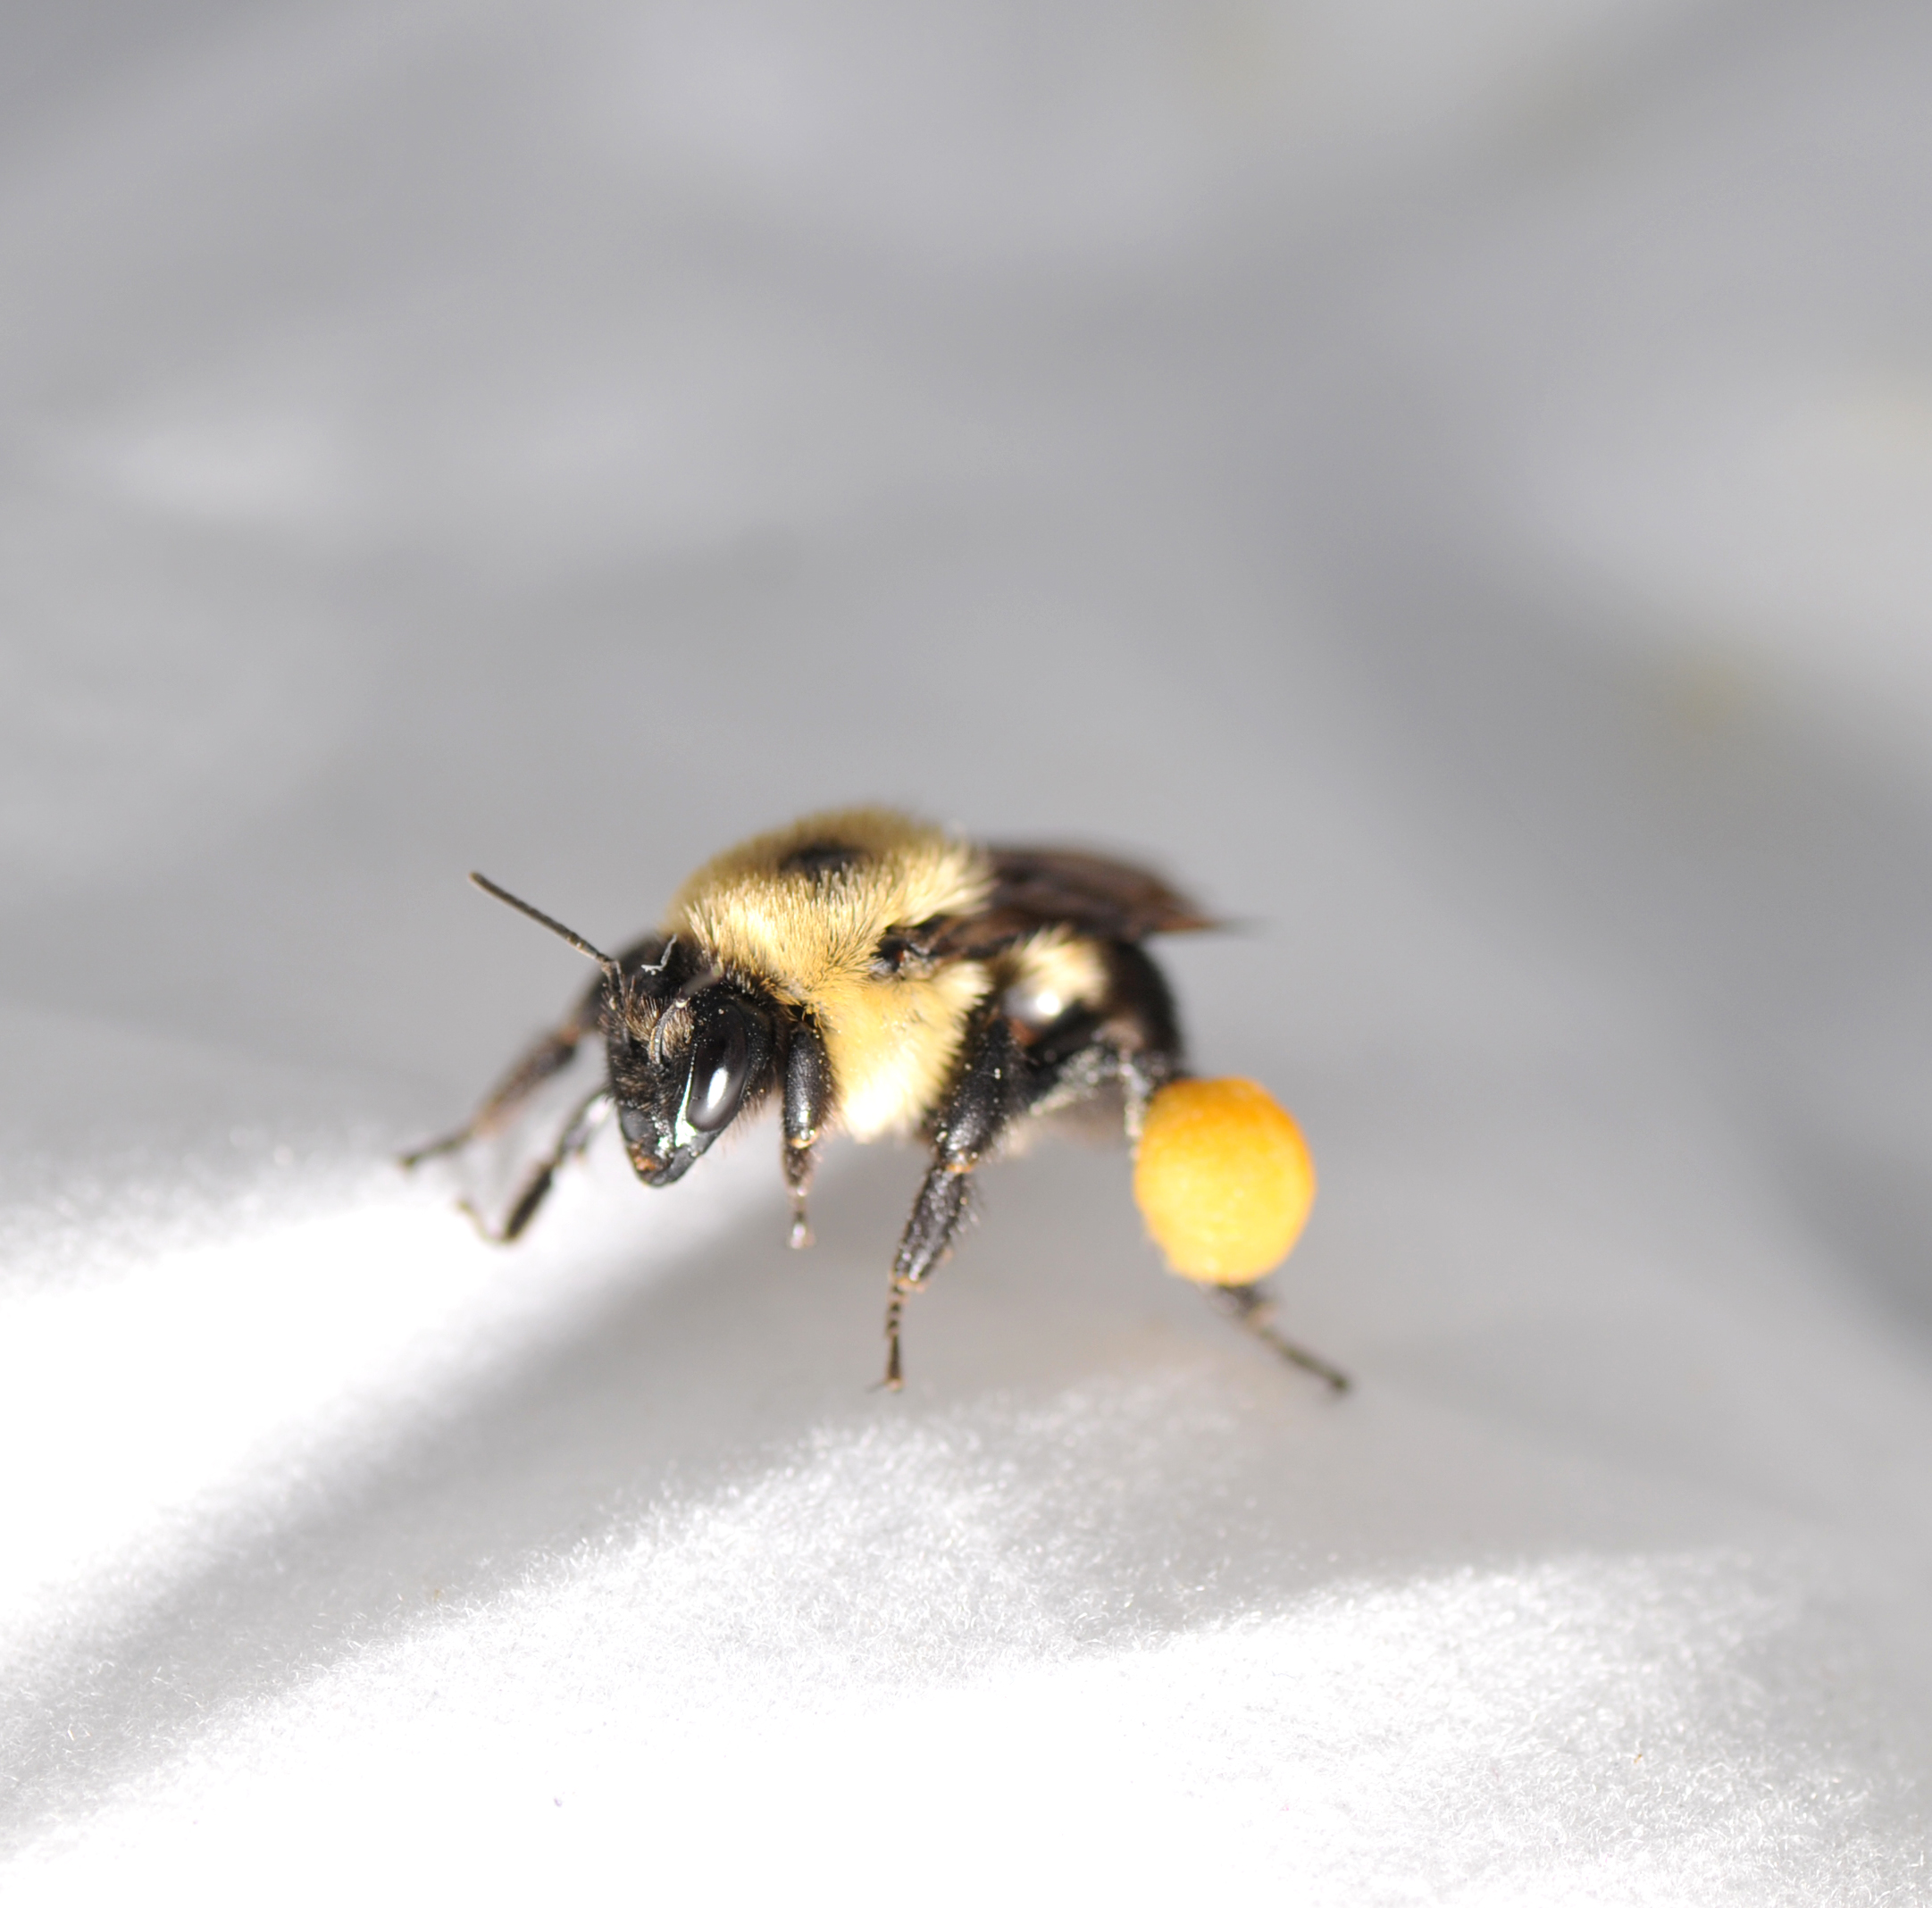 Female bumblebee with pollen on pollen baskets